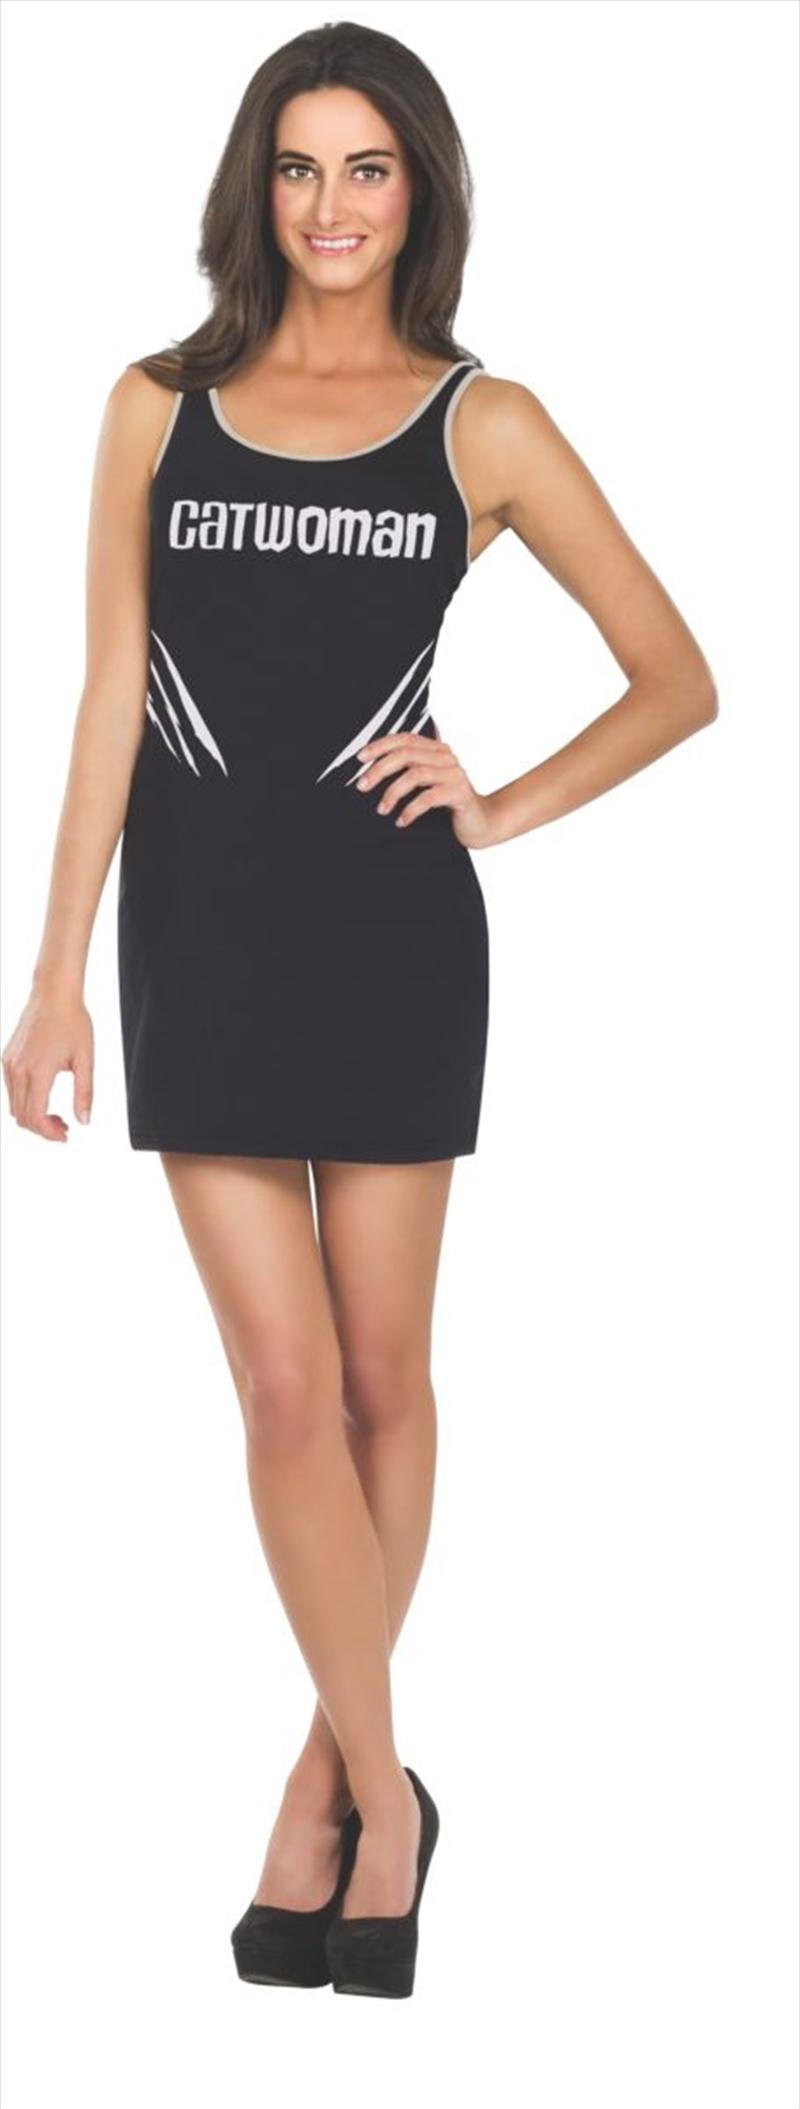 Catwoman Tank Dress: Size Medium   Apparel